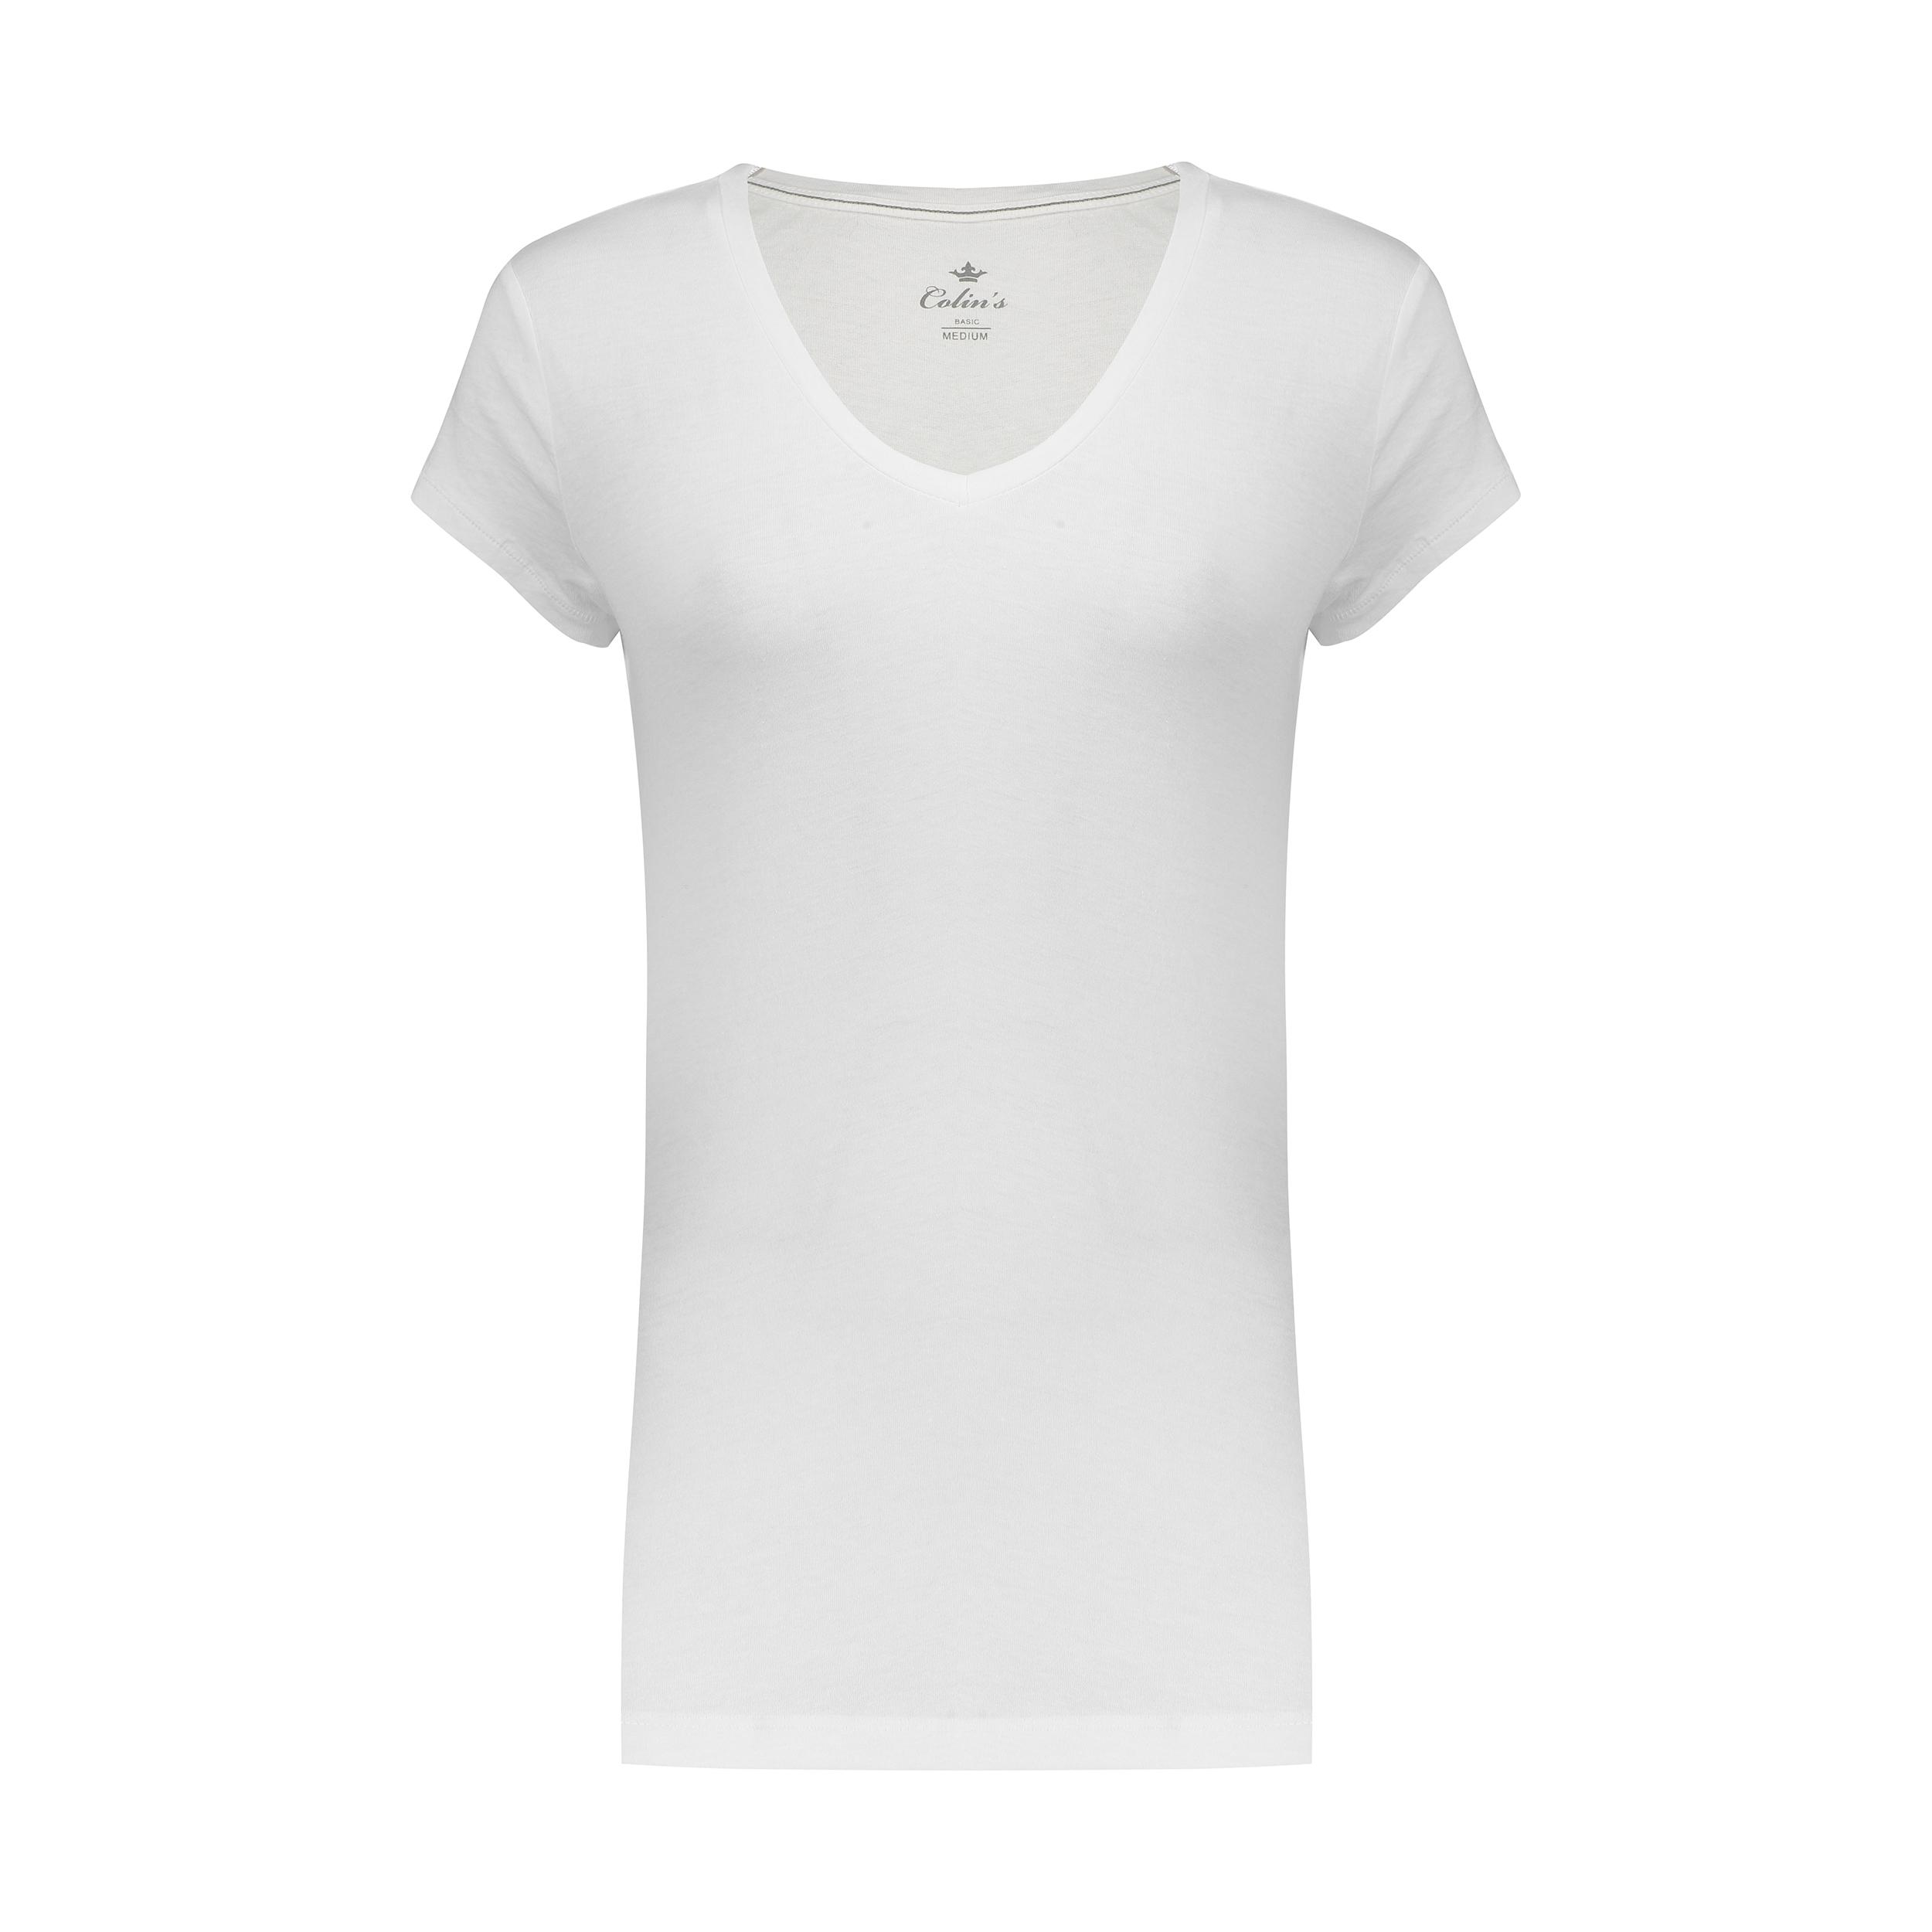 تی شرت زنانه کالینز مدل CL1019324-WHITE